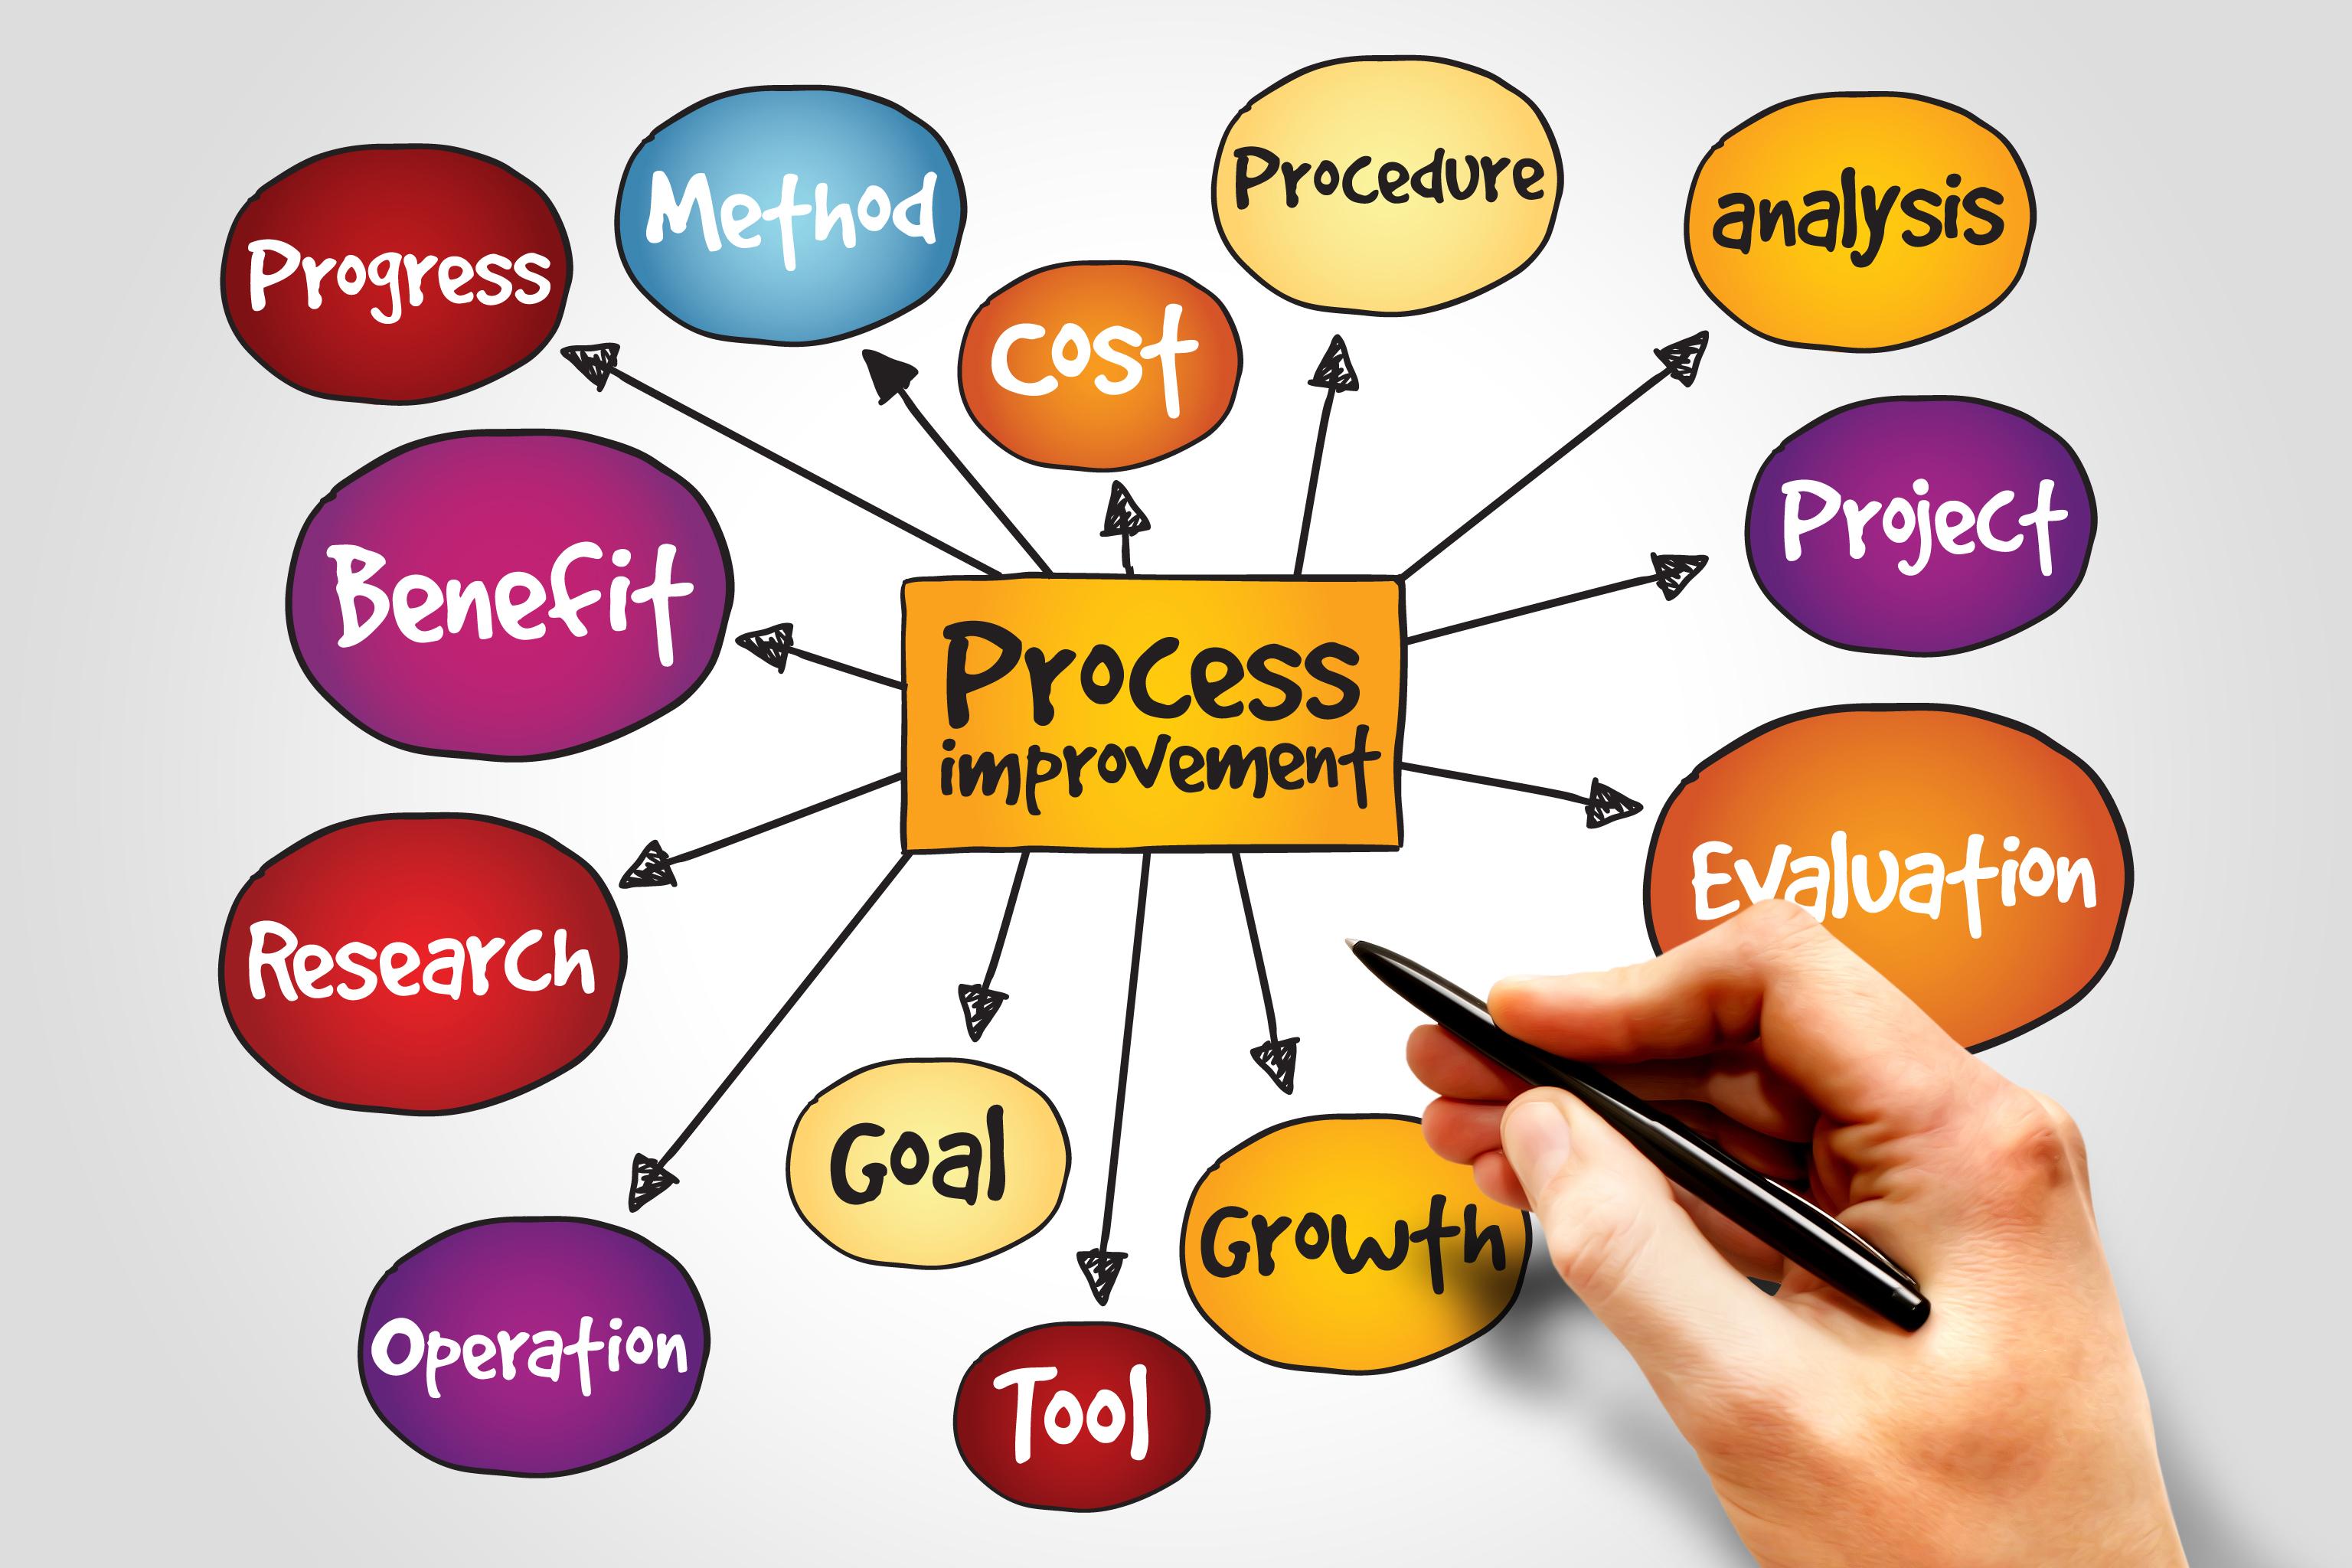 process improvement arp data protection services